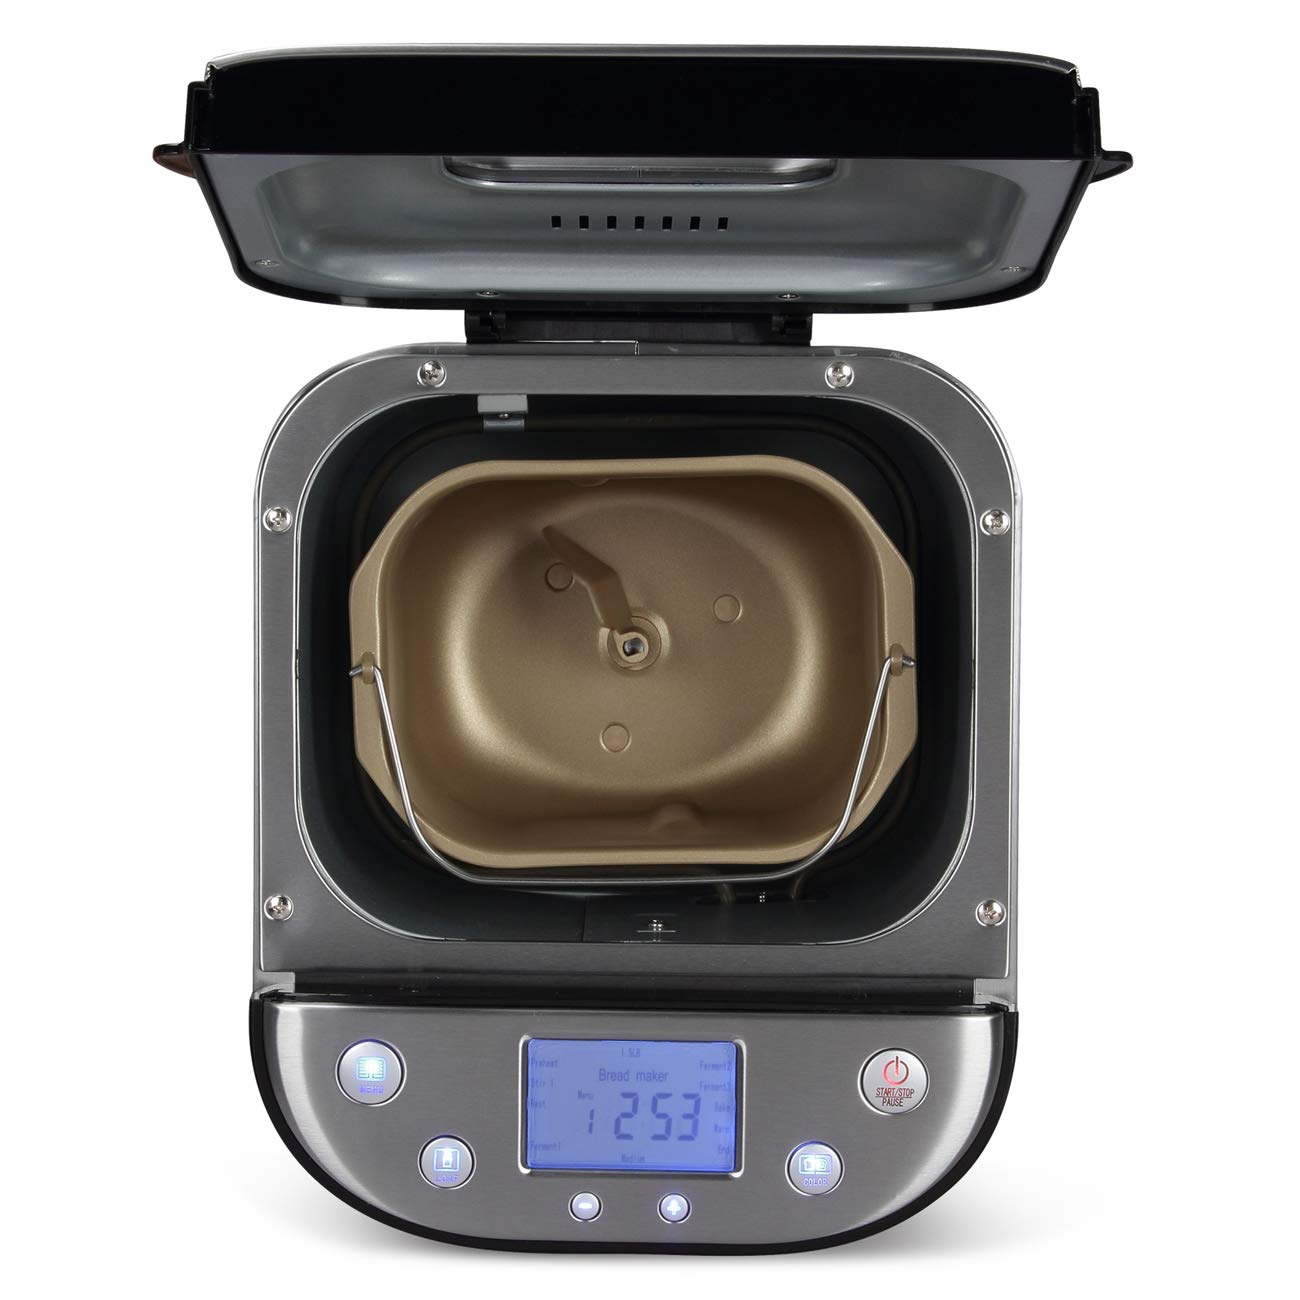 Amazon.com: DELLA 2LB - Máquina de pan, temporizador ...